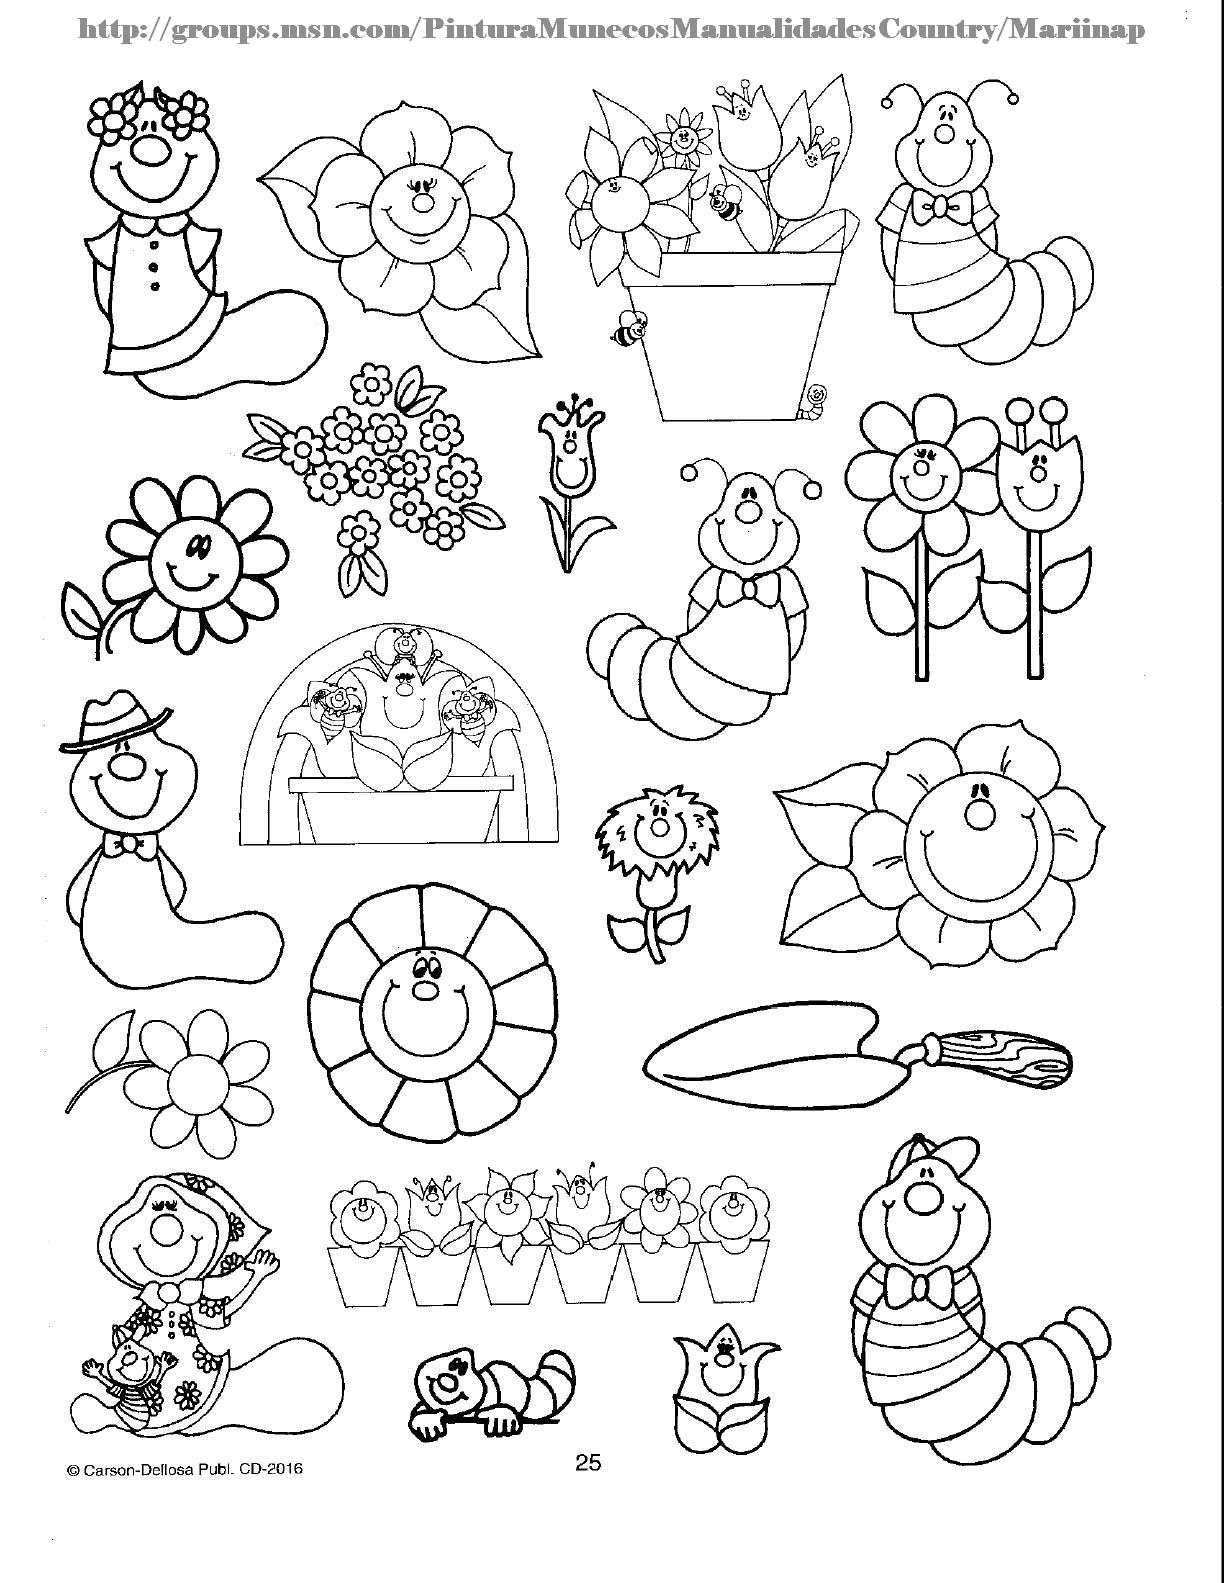 Renovados desenhos para imprimir e colorir - Fotos de insectos para imprimir ...